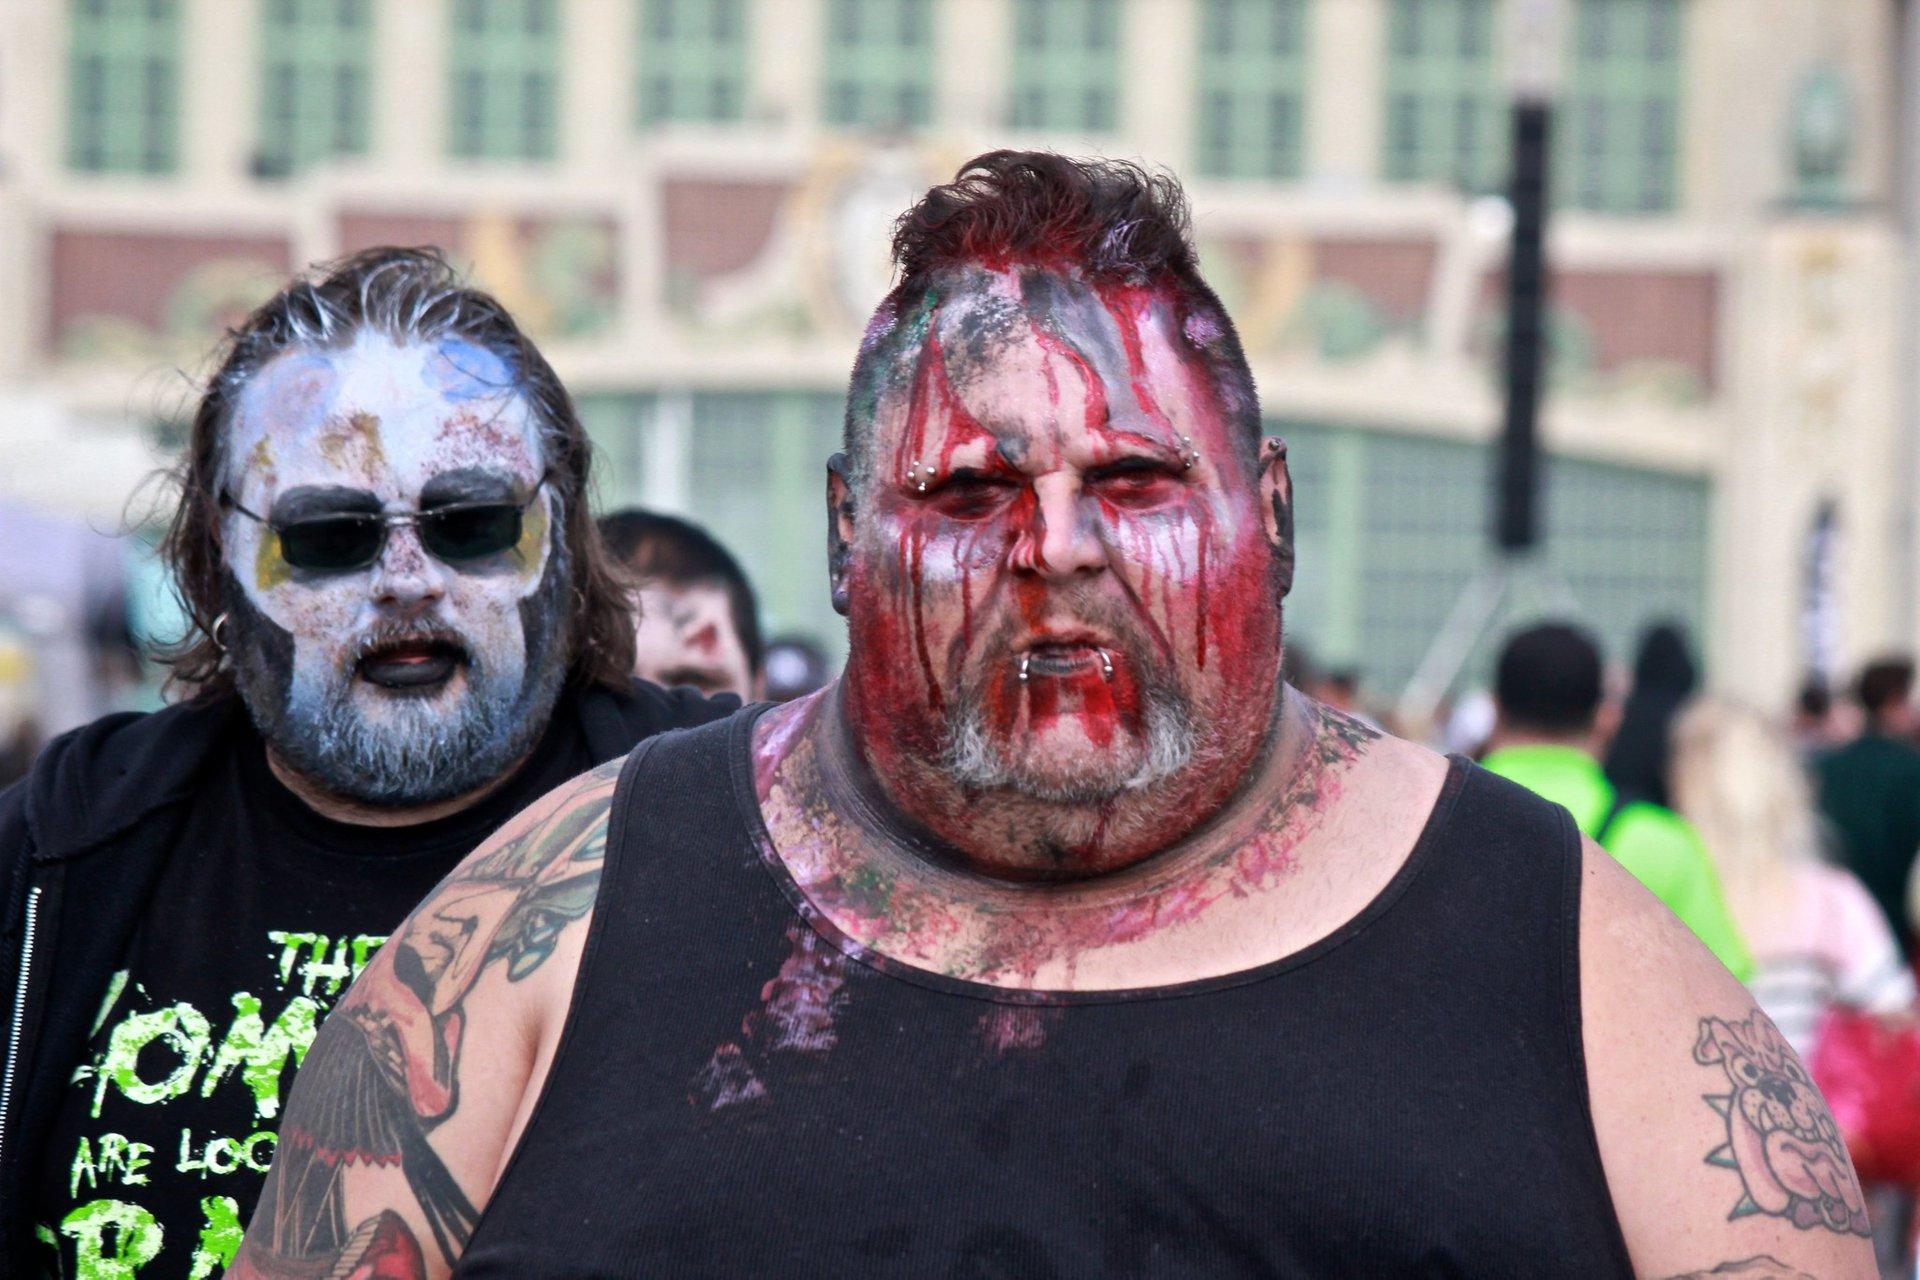 Asbury Park Zombie Walk 2013 2020